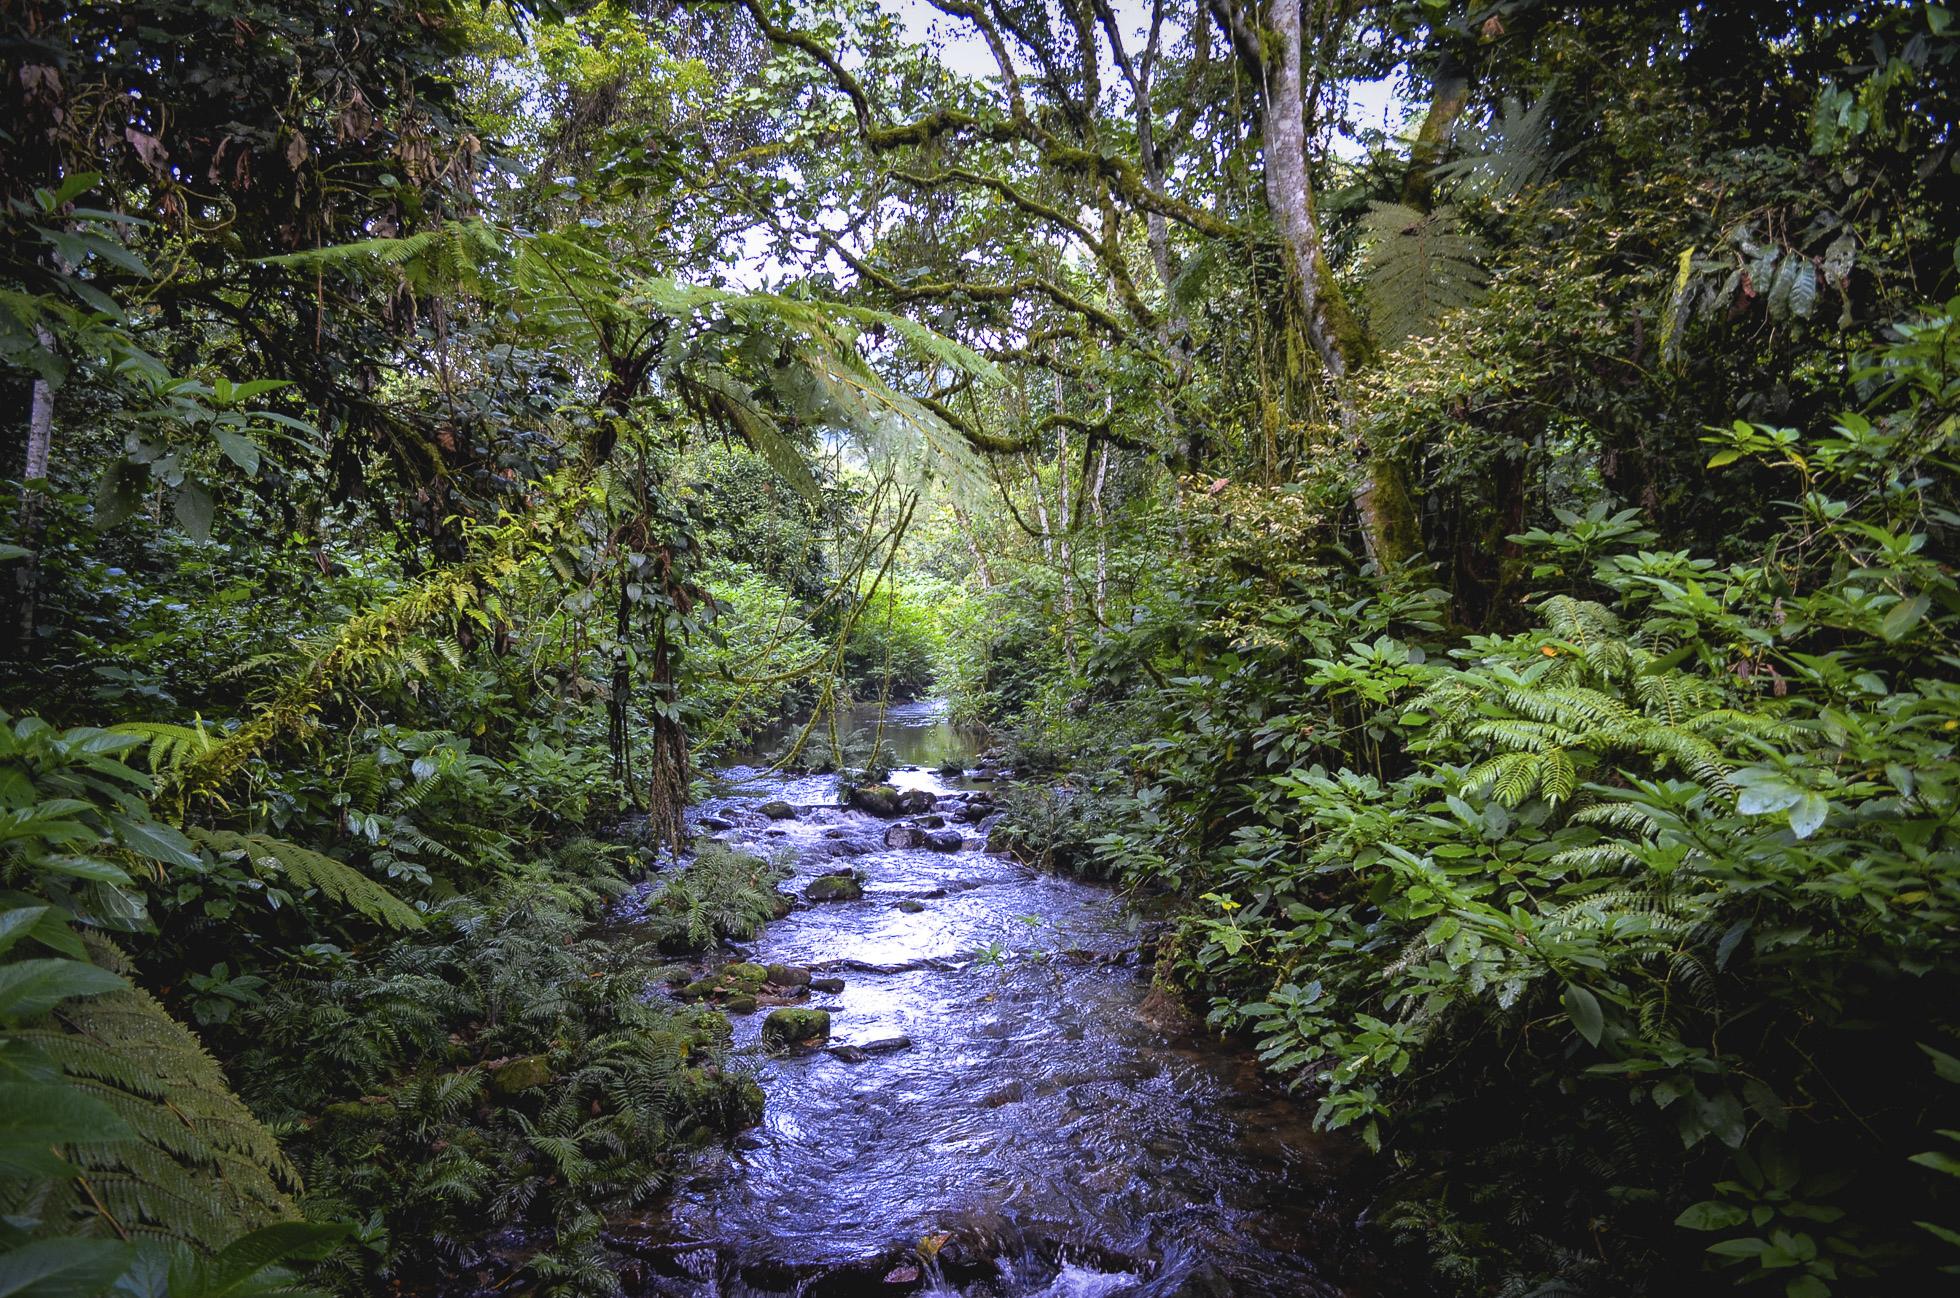 cree k through dense jungle